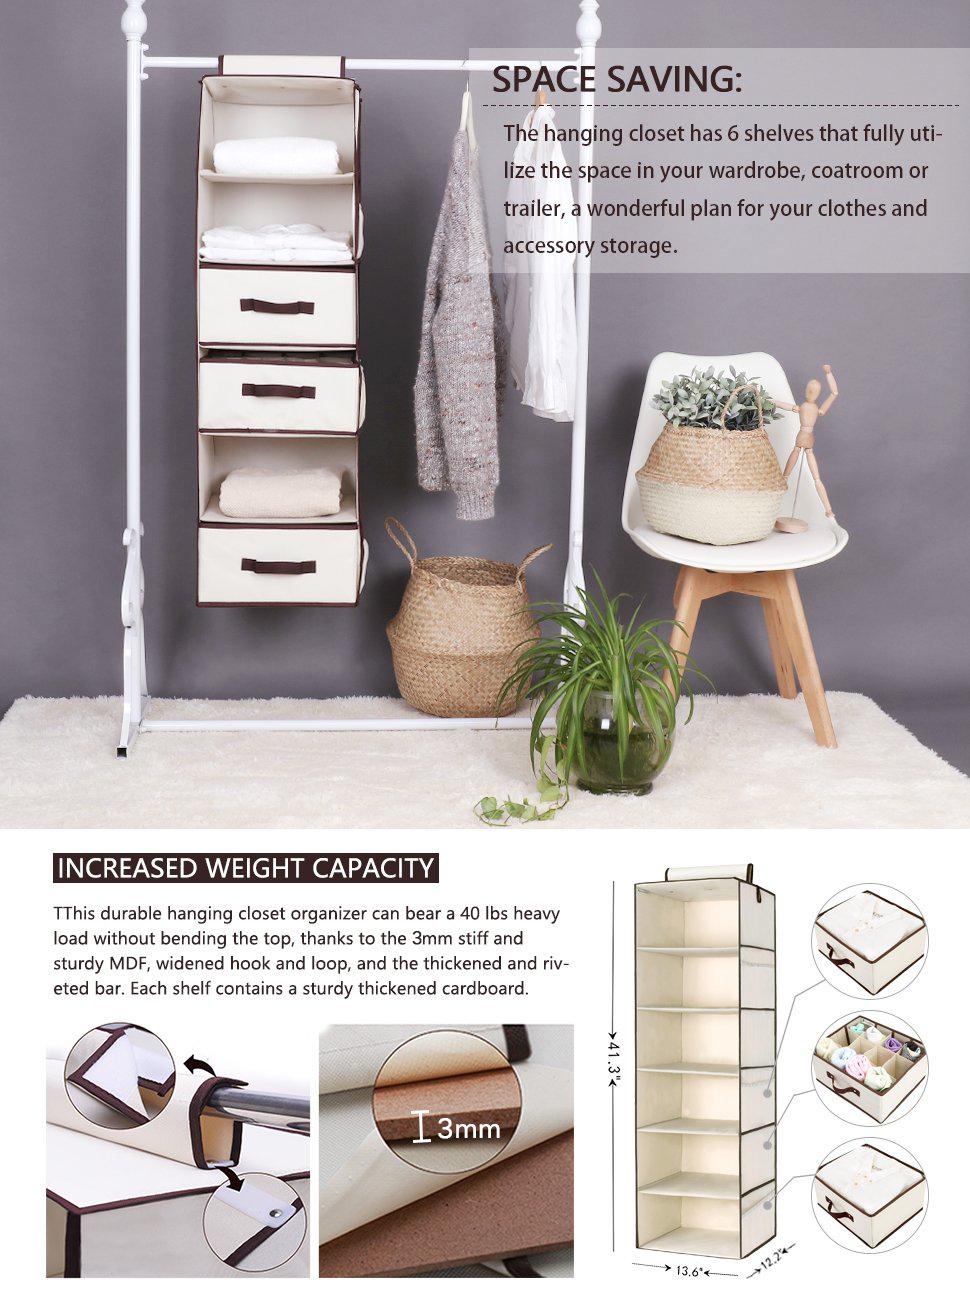 StorageWorks Polyester Canvas Hanging Closet Organizer With 2 Drawers U0026 1  Underwear Drawer, Foldable Hanging Accessory Shelves, Natural, 6 Shelf